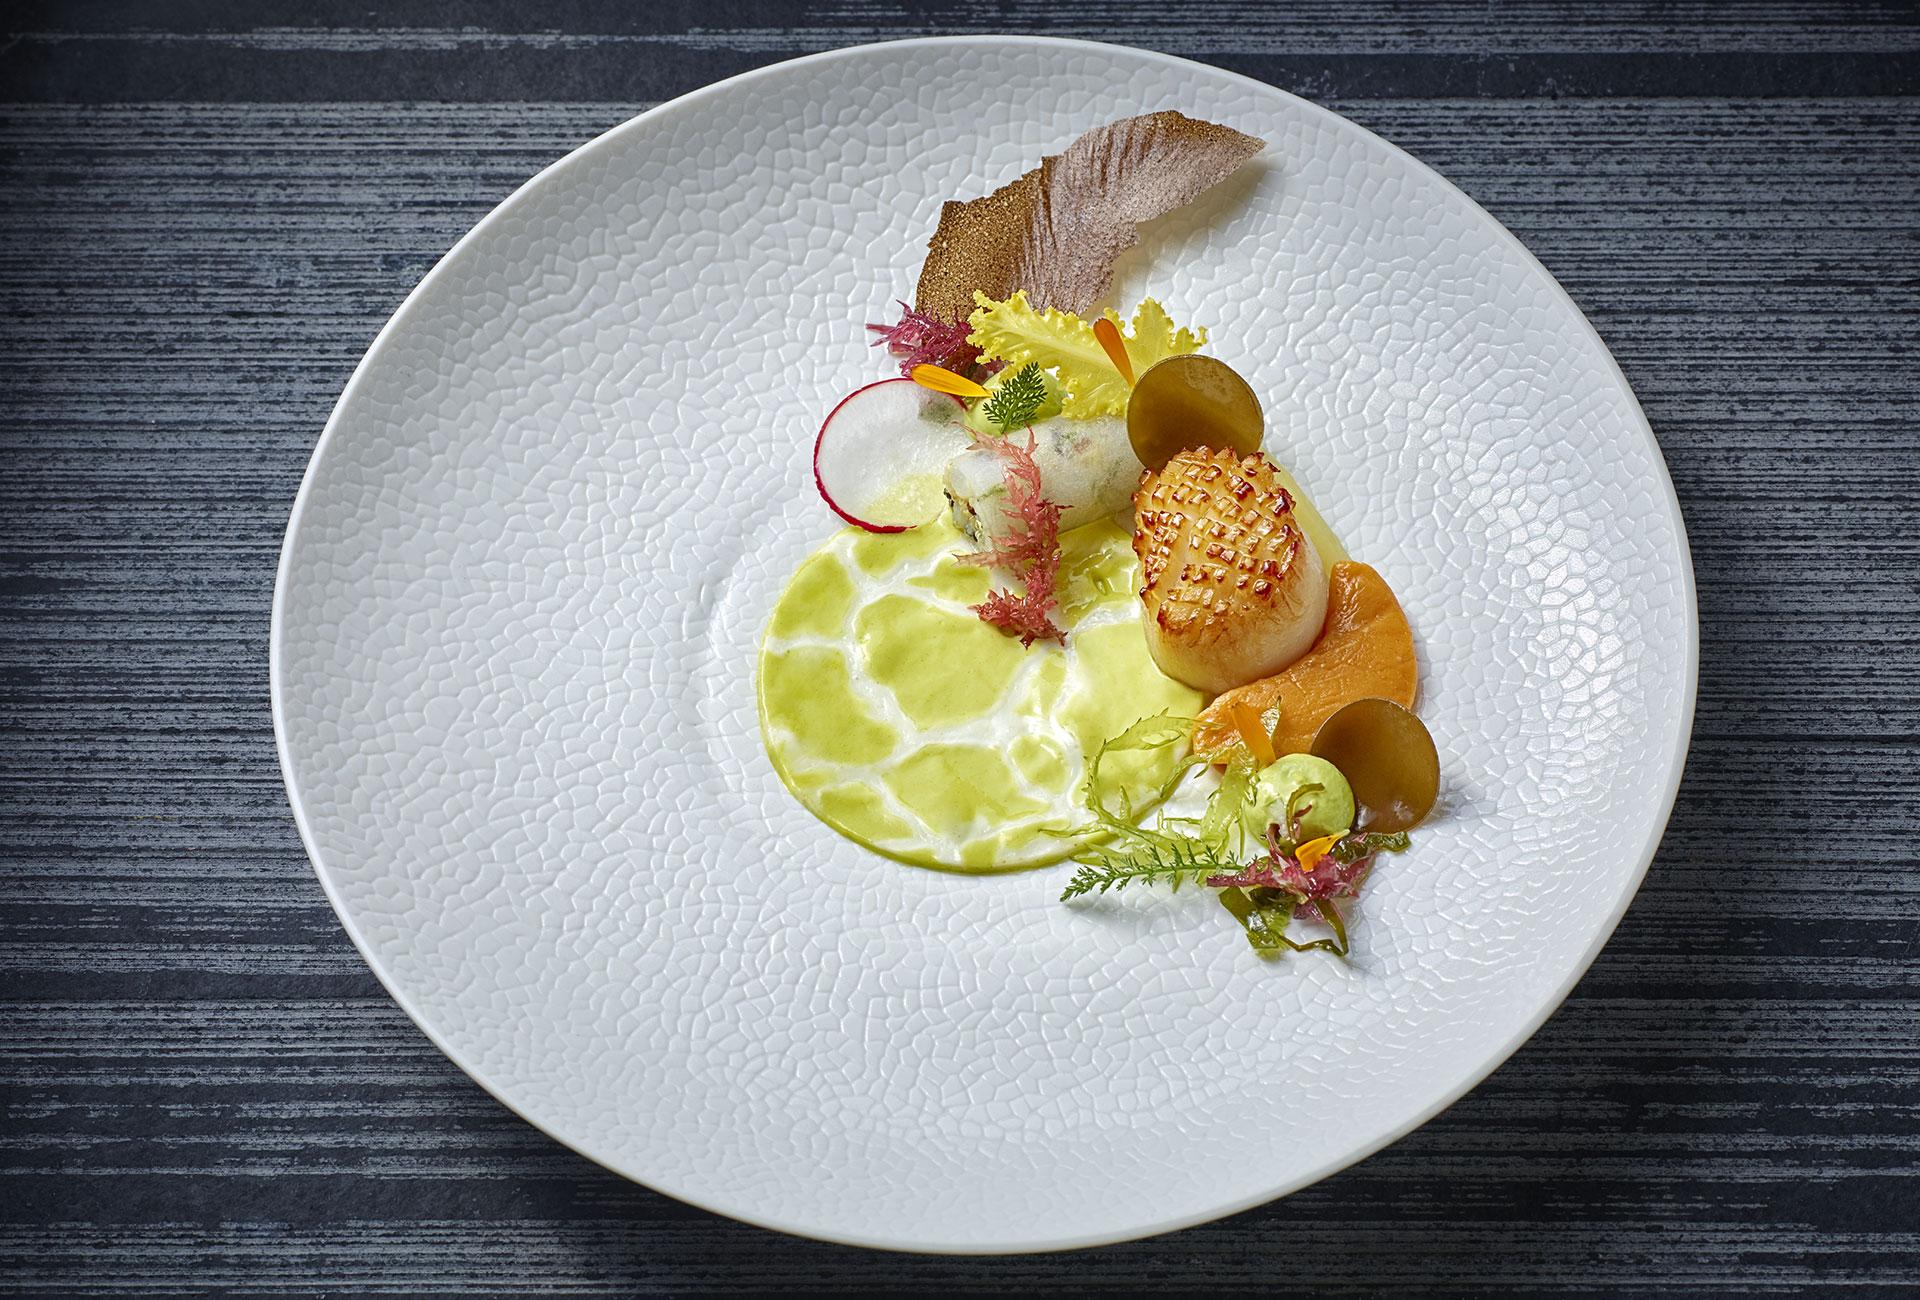 Fotoproduktion Werneckhof Foodstills Bild 12